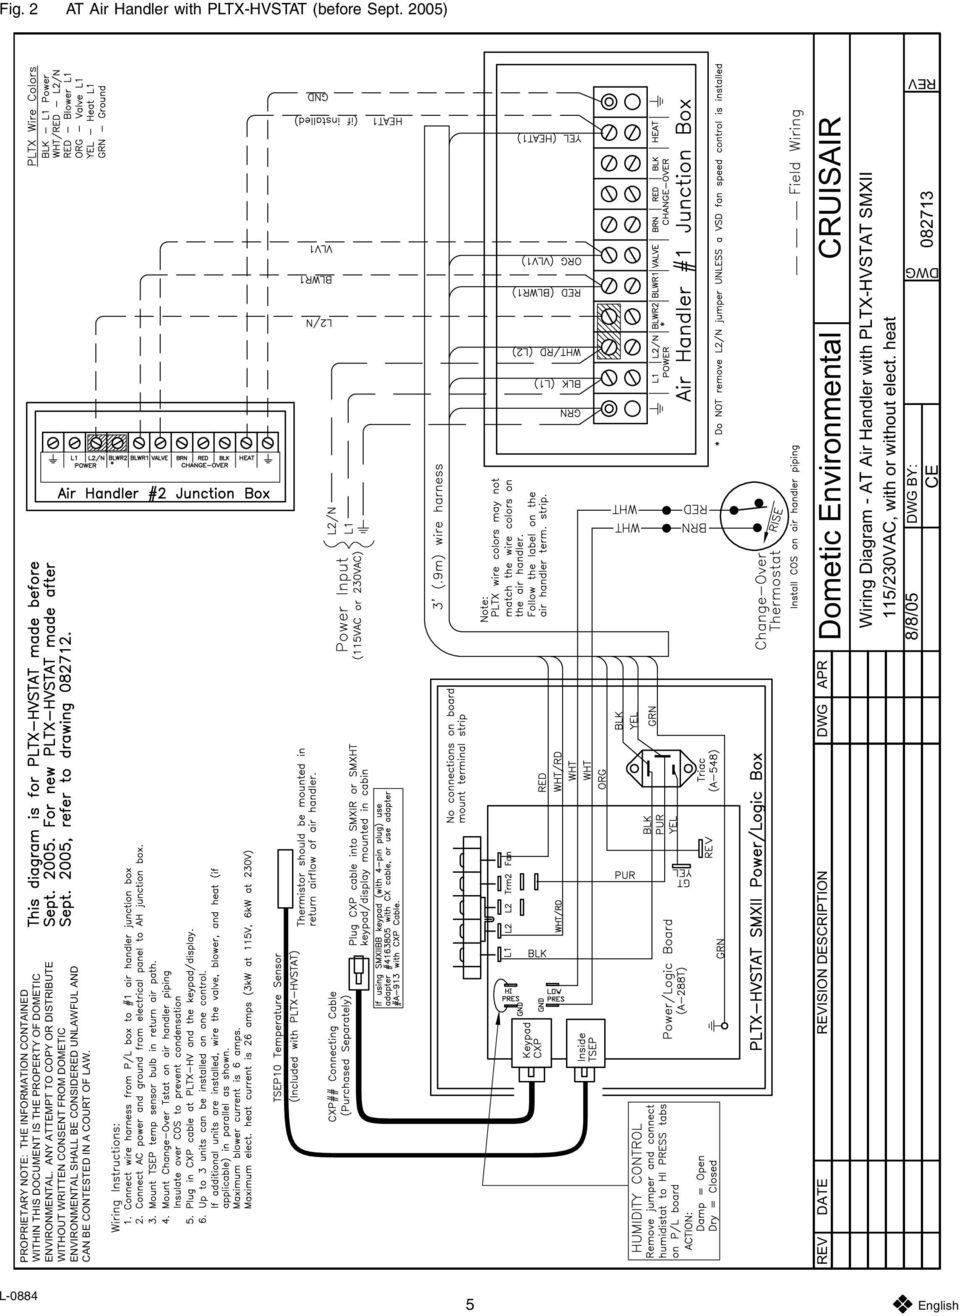 zamil ac wiring diagram free download wiring diagram xwiaw smc wiring diagram free download wiring diagram tw air handler wiring diagrams pdf of zamil ac wiring diagram